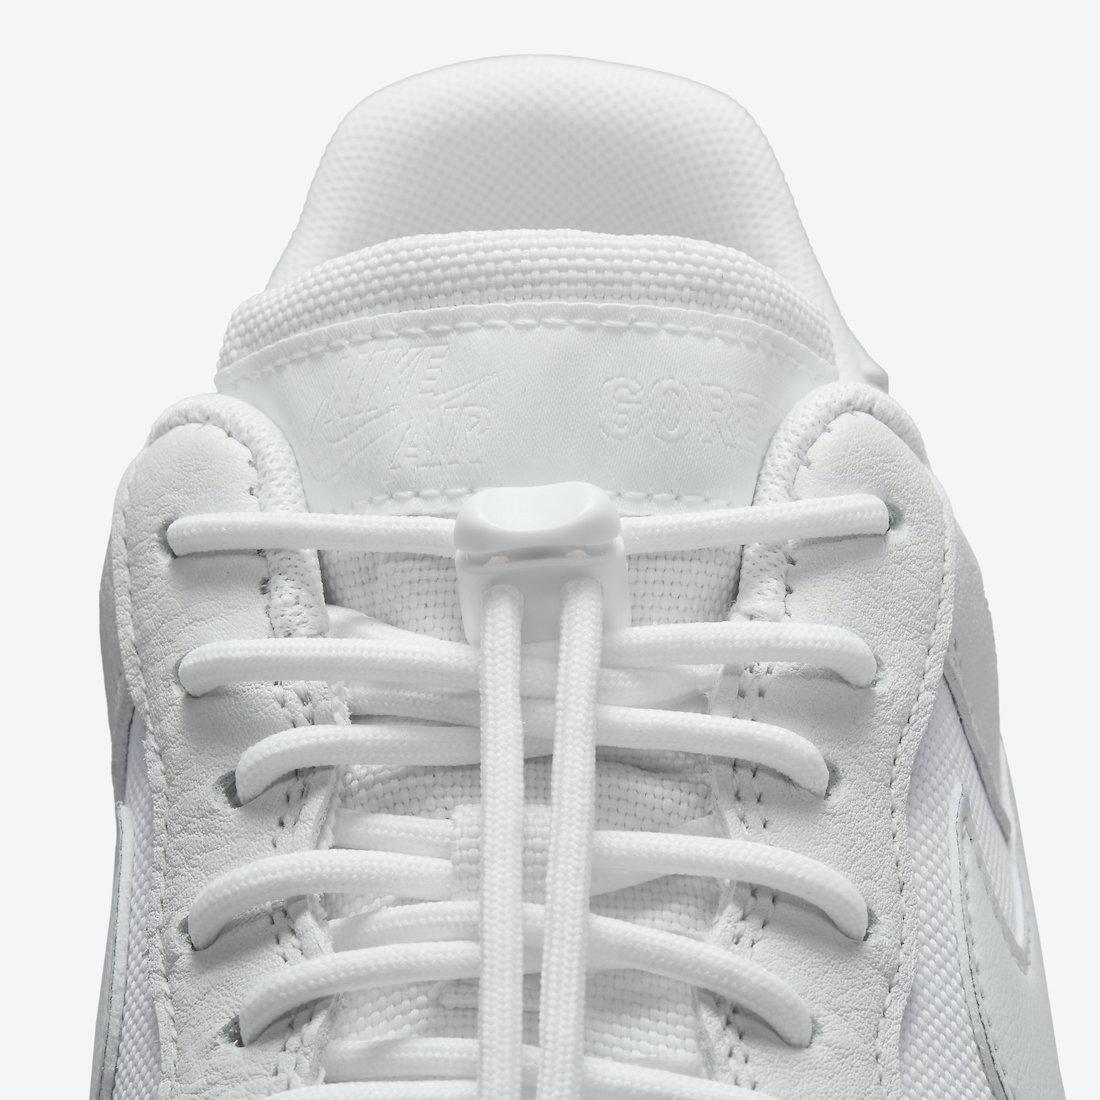 Nike Air Force 1 Gore-Tex Summer Shower DJ7968-100 Release Date Info